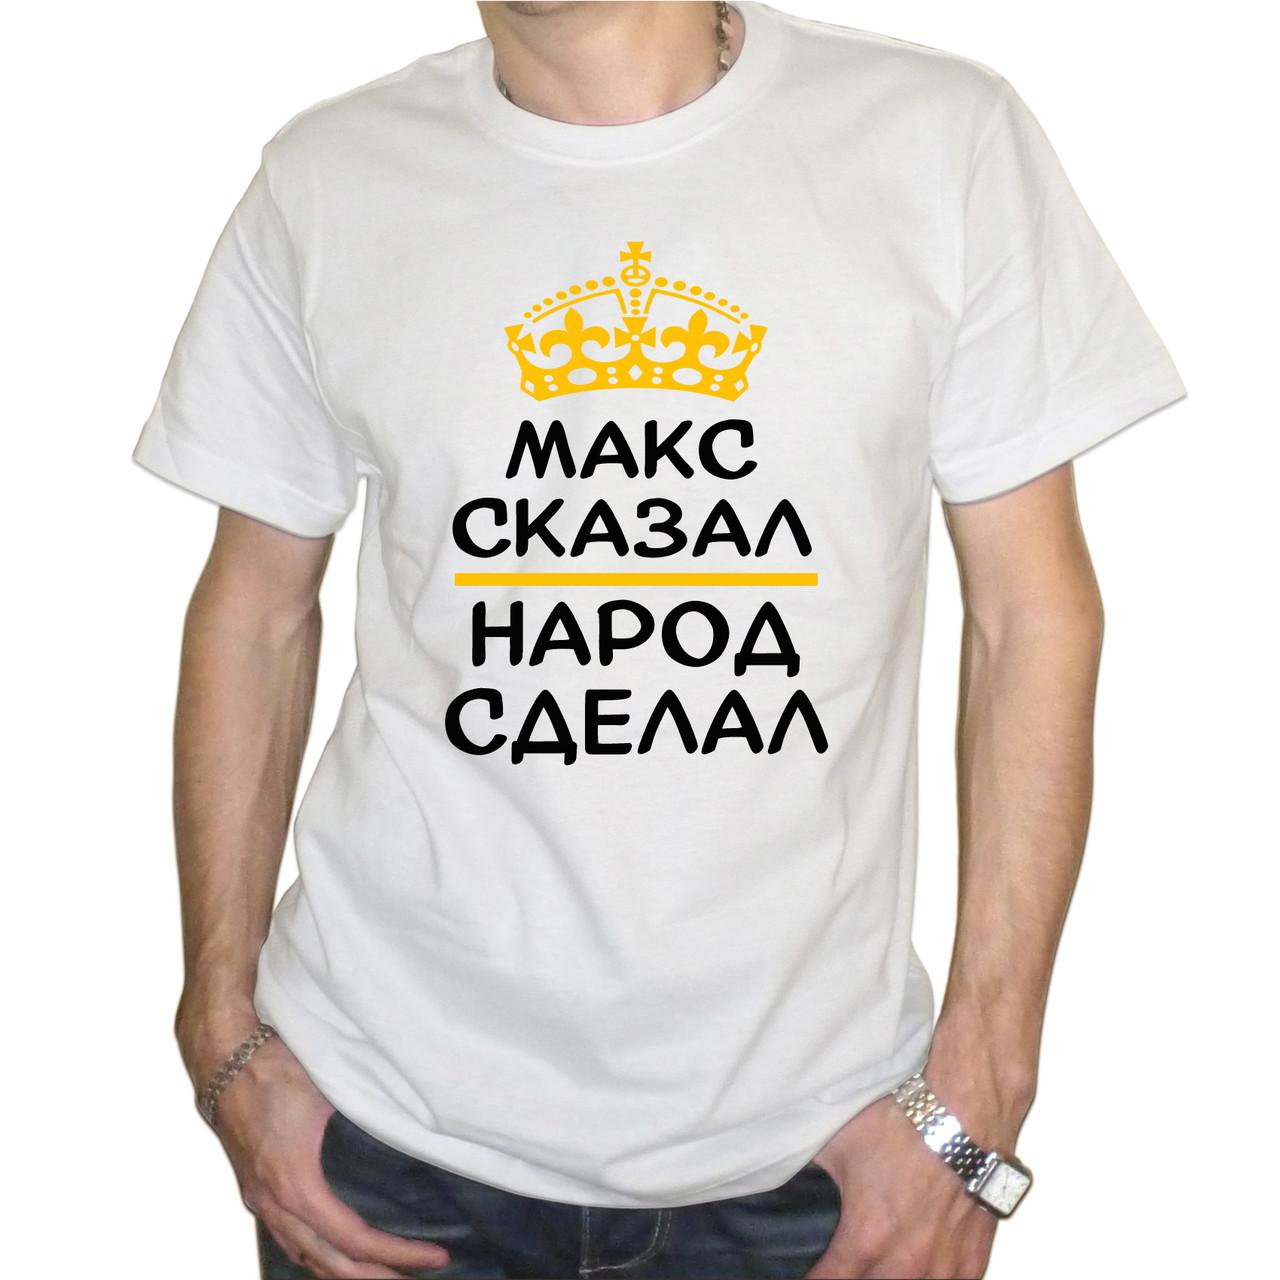 "Мужская футболка ""Макс сказал - народ сделал"""